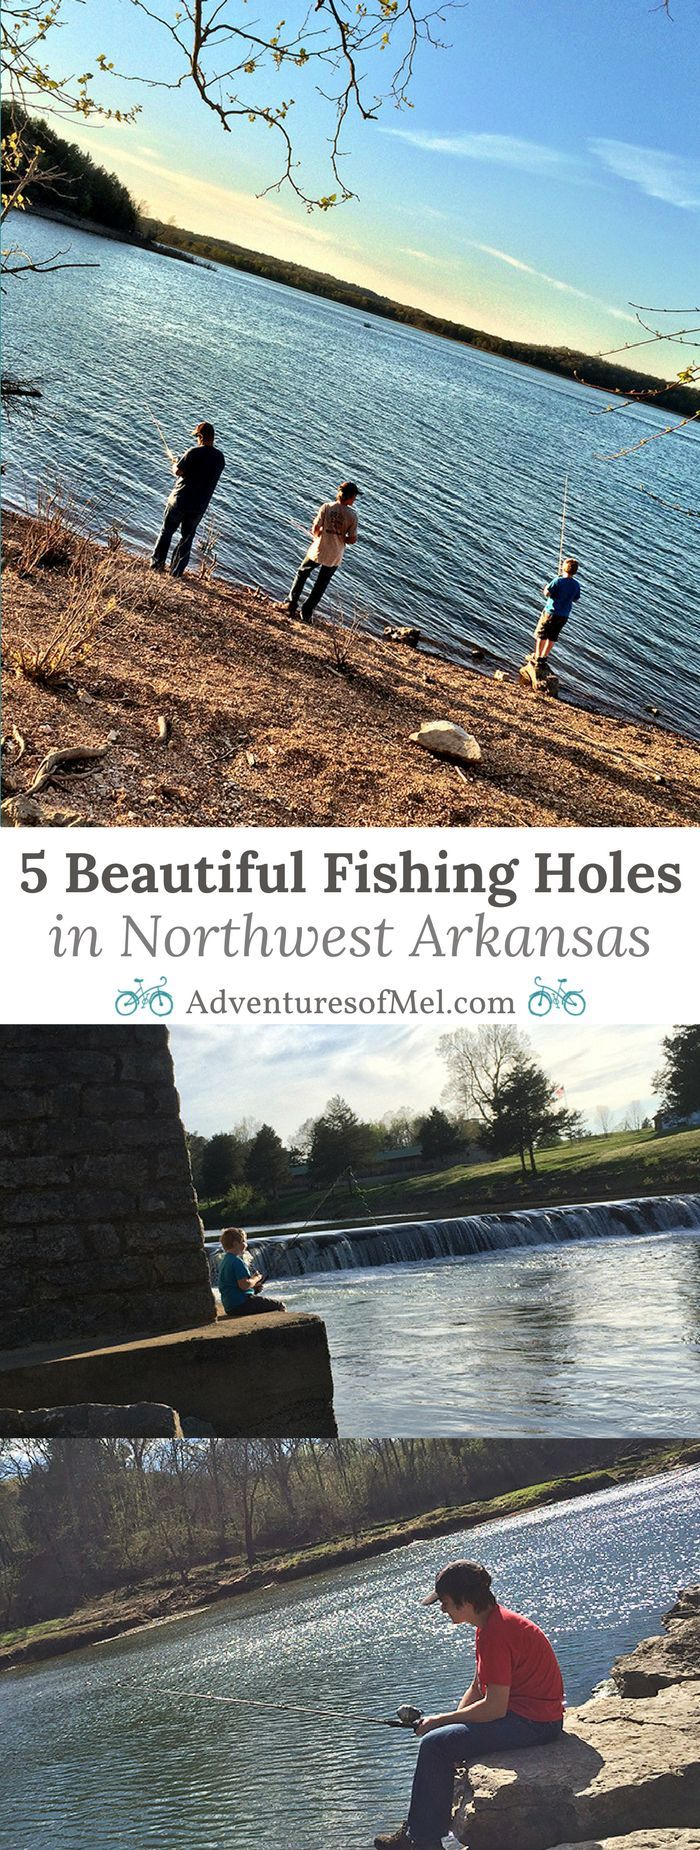 5 Beautiful Fishing Holes in Northwest Arkansas